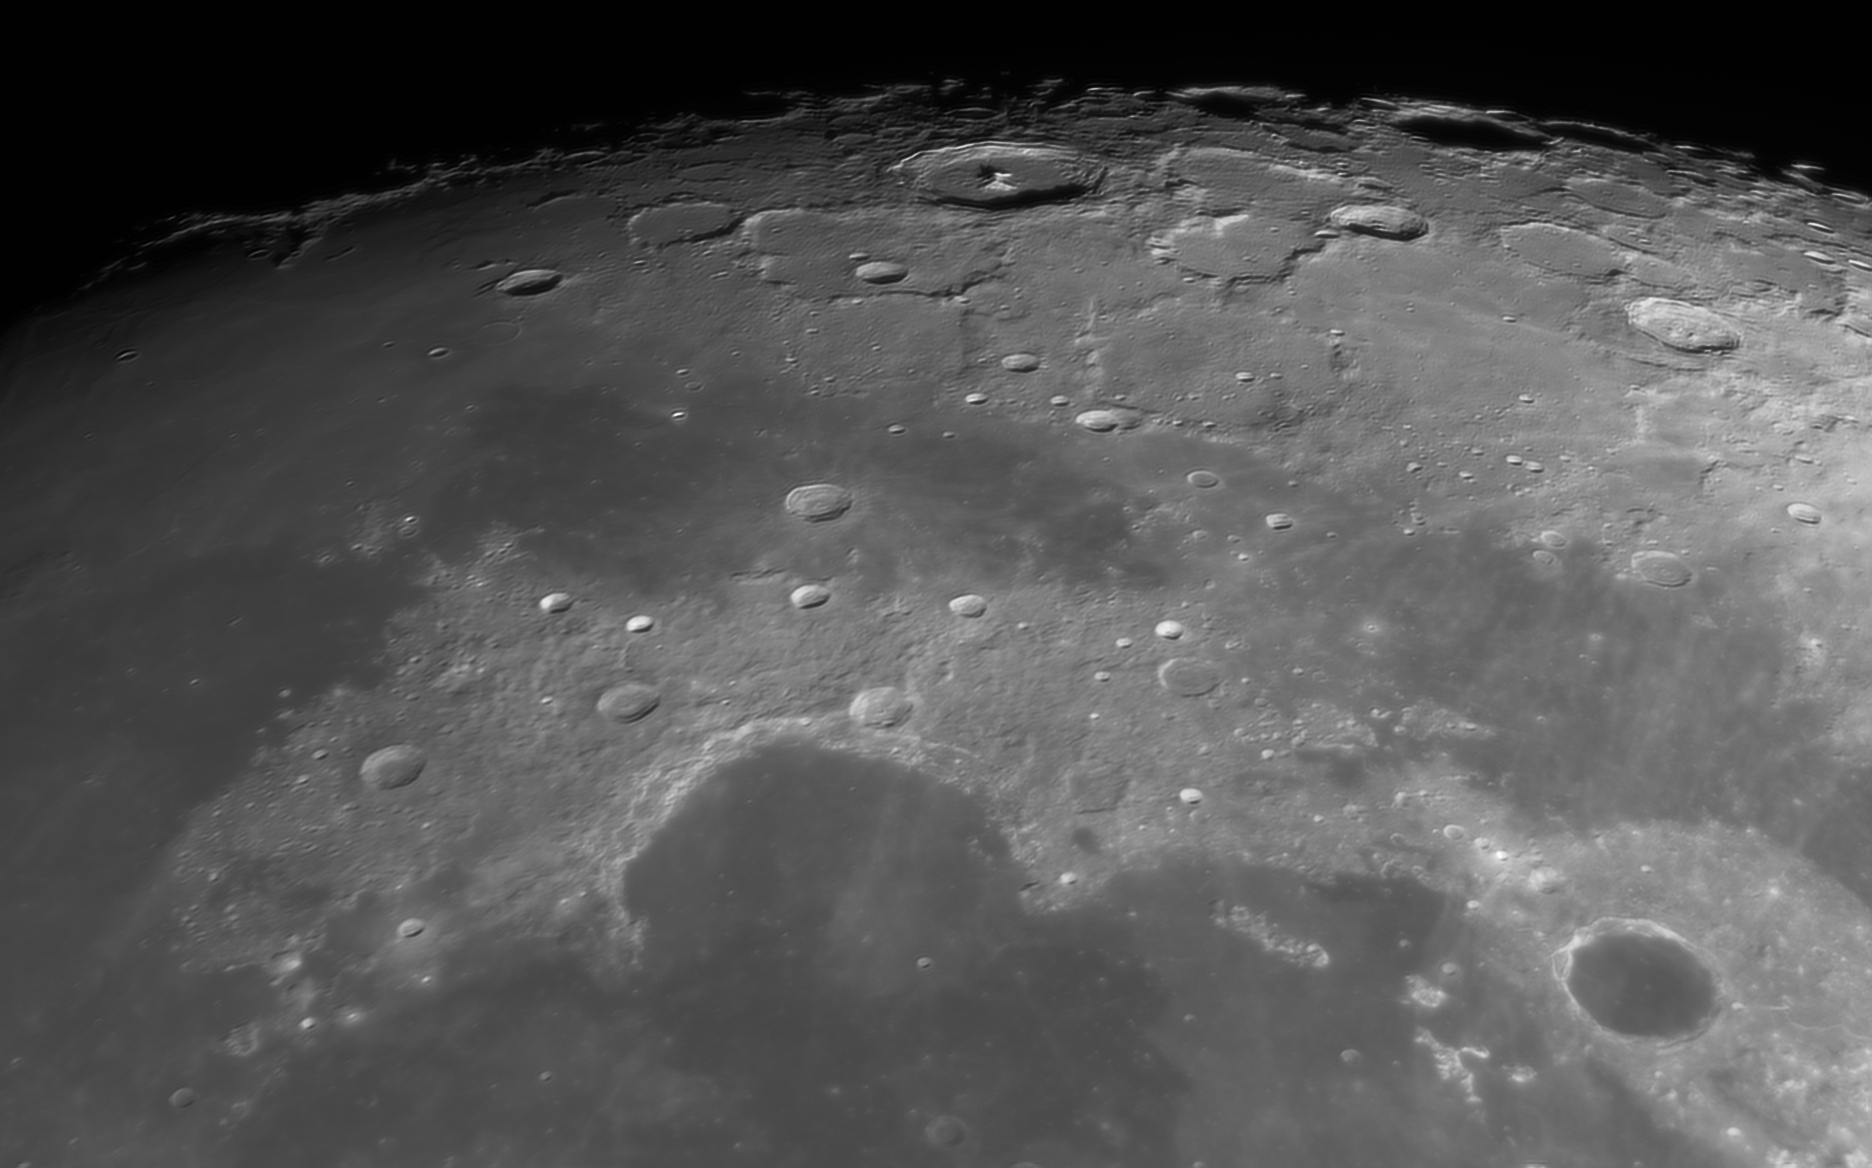 lune_10nov2019_20h54tu.jpg.fbef69d7e3b7fc69fc1e8d11621c517a.jpg